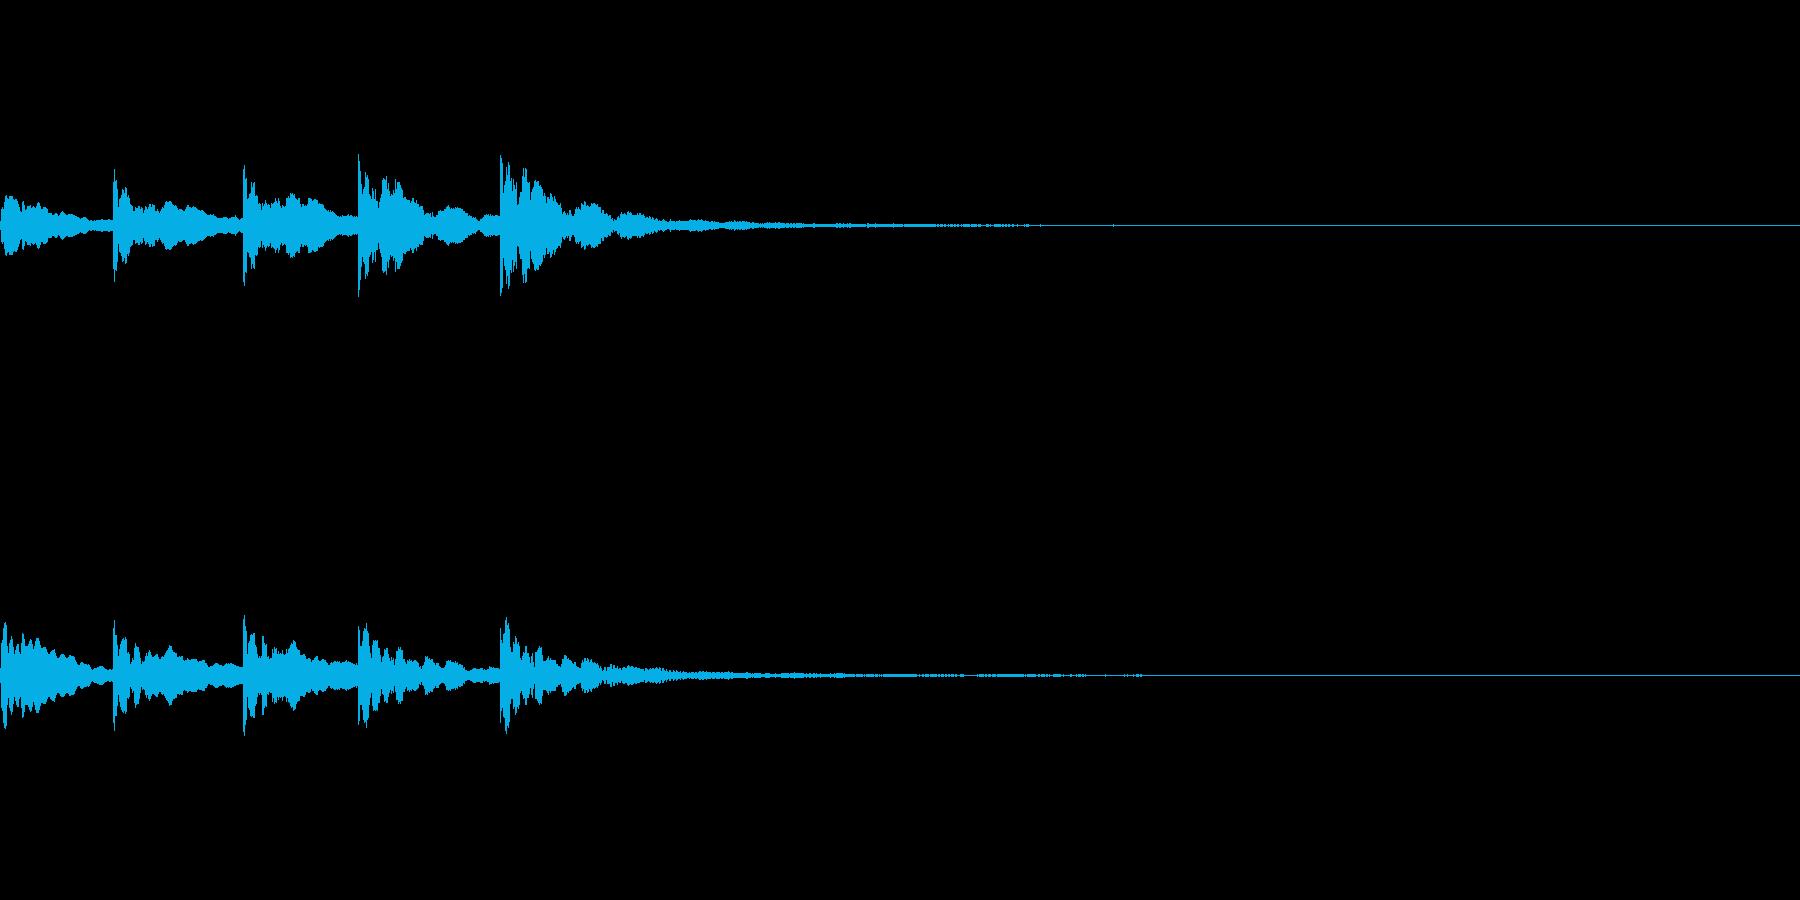 【SE 効果音】ティロティリロリン2の再生済みの波形